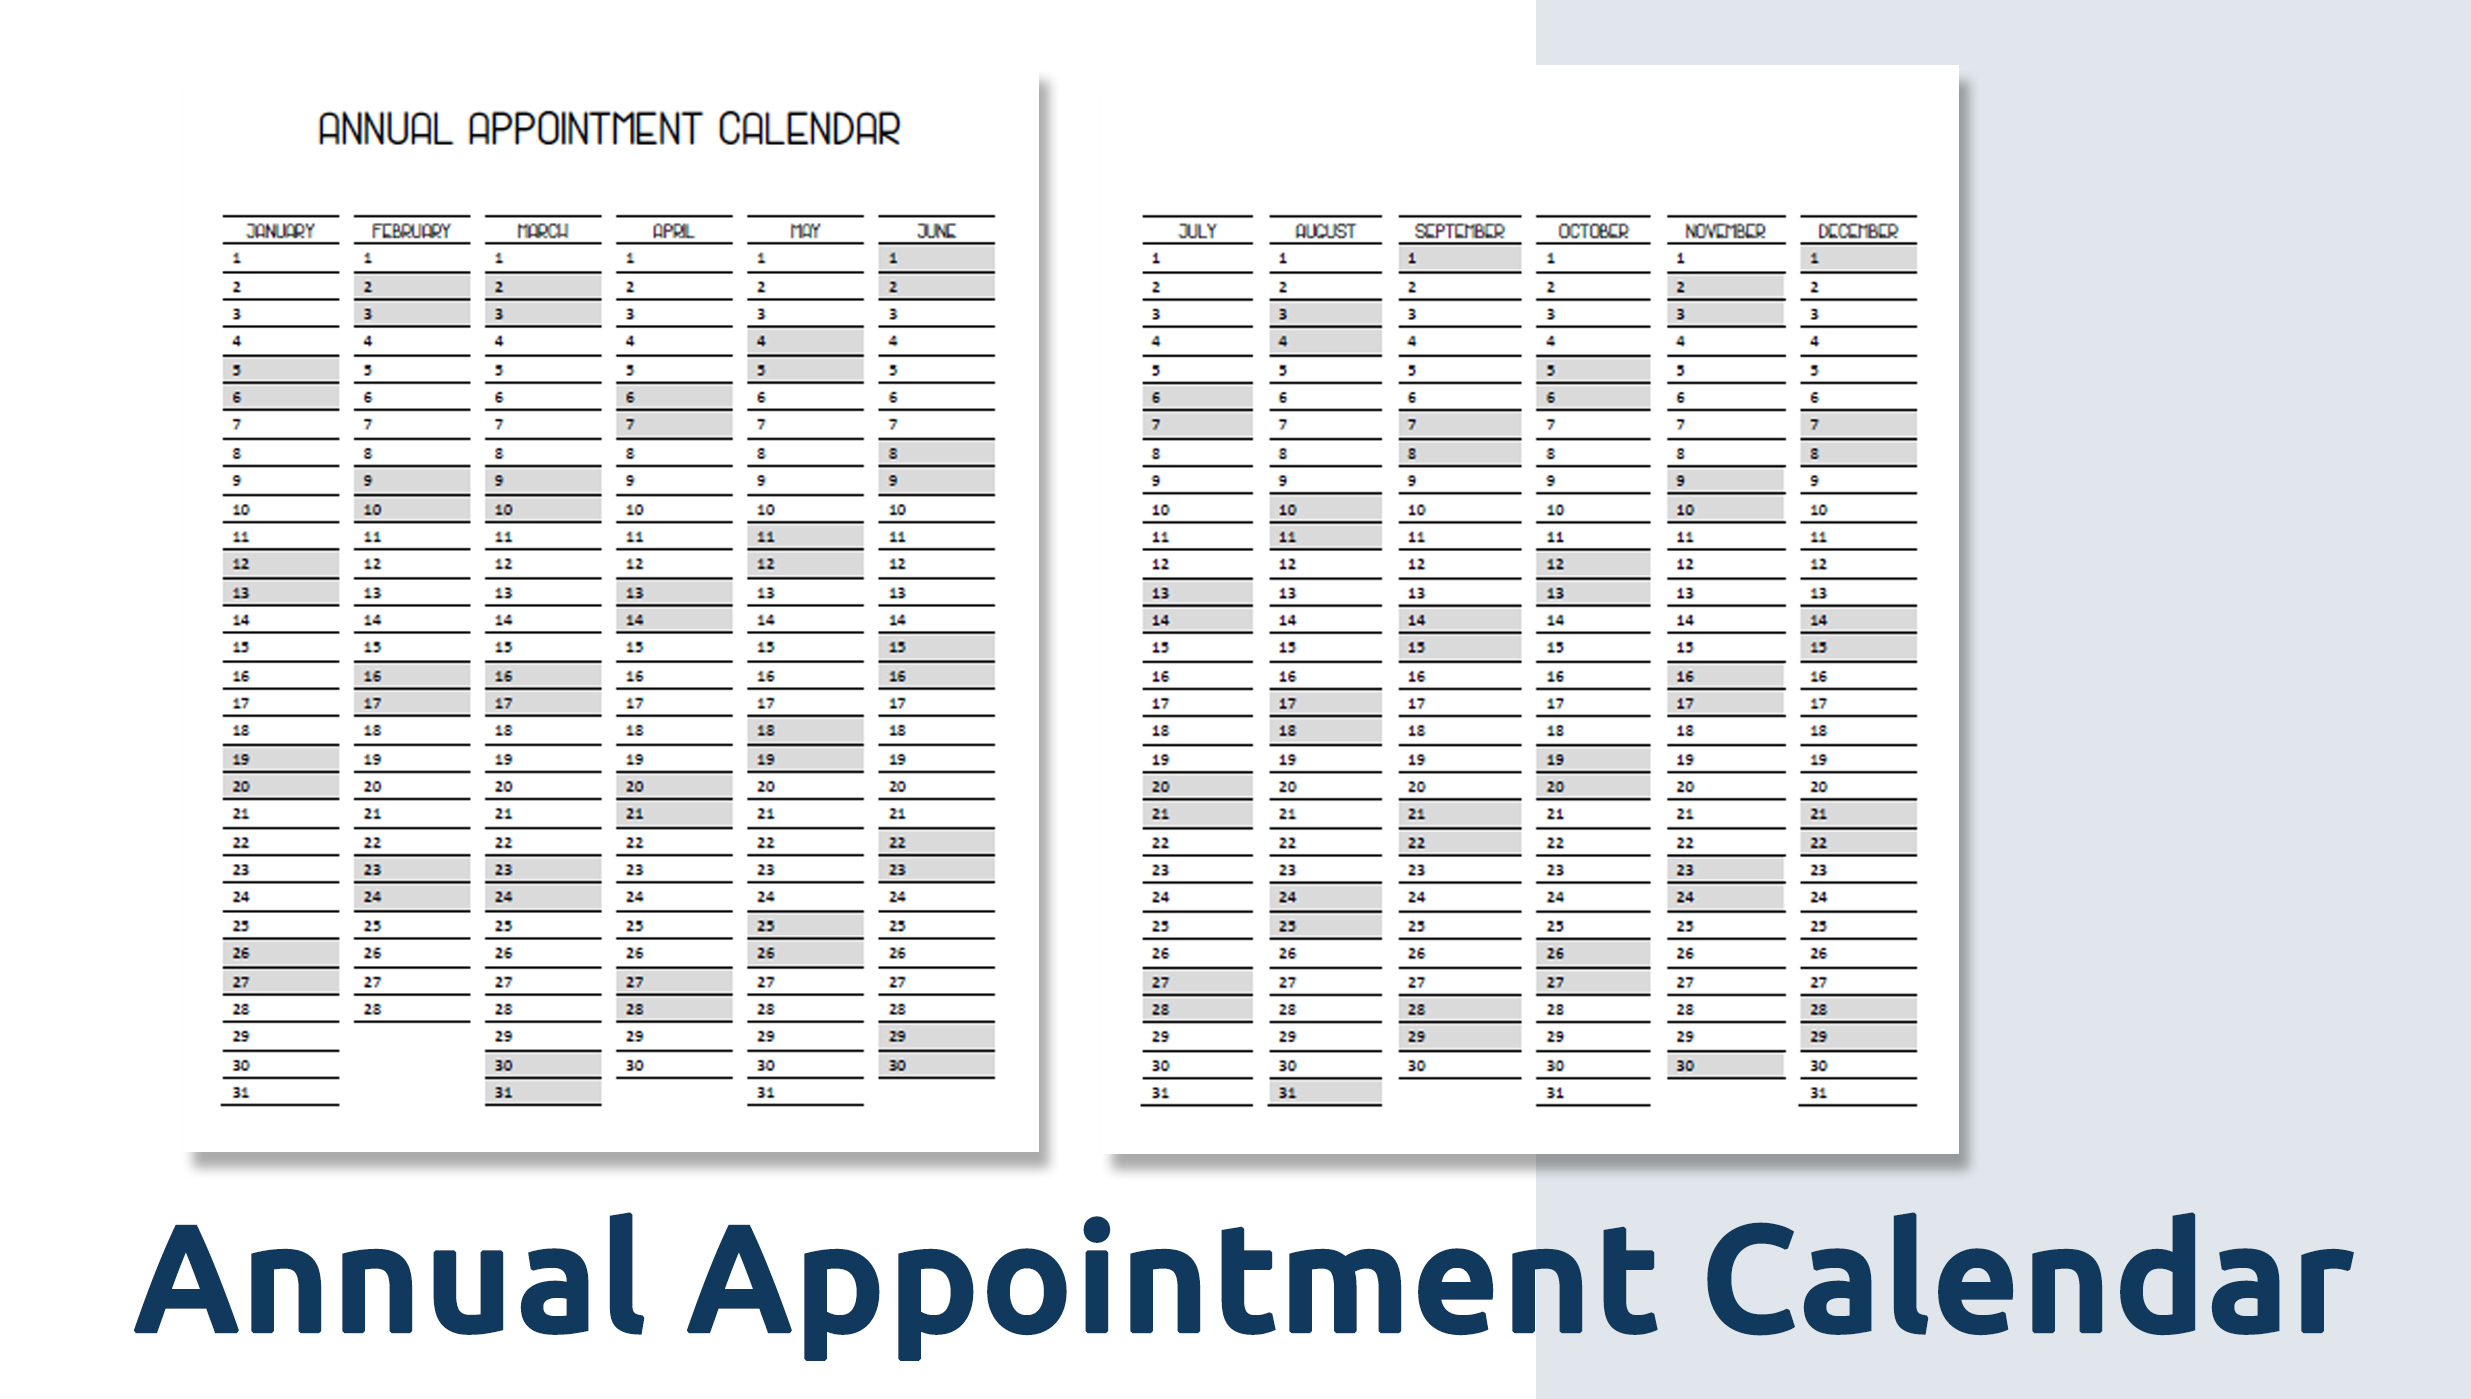 annual appointment calendar.jpg